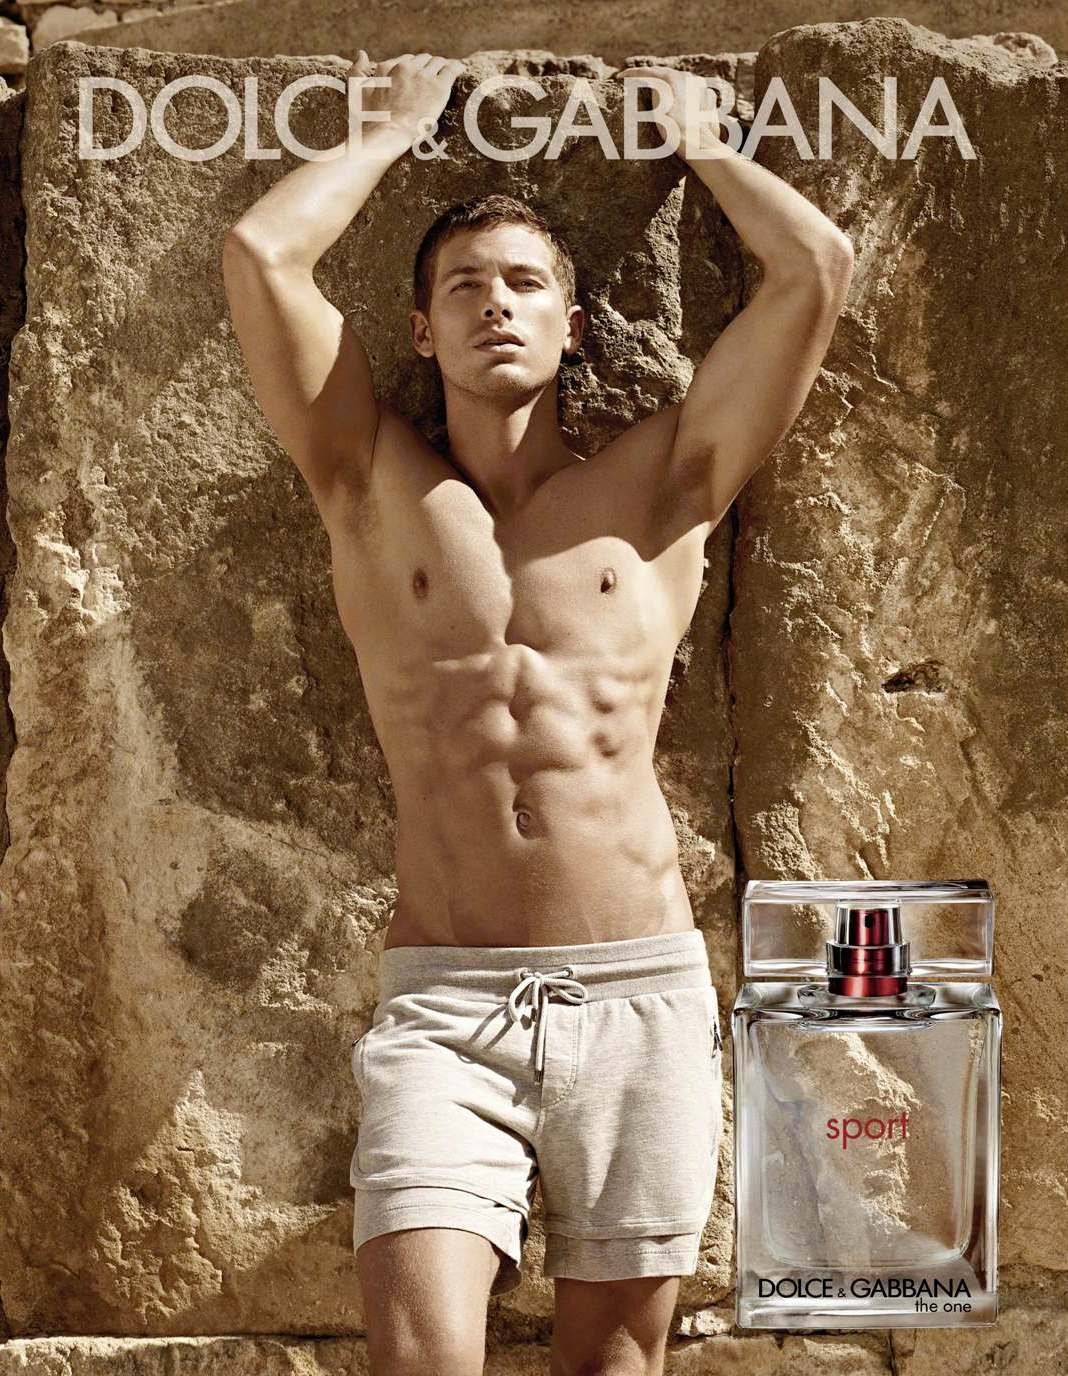 The One Sport Dolce Gabbana Adam Senn